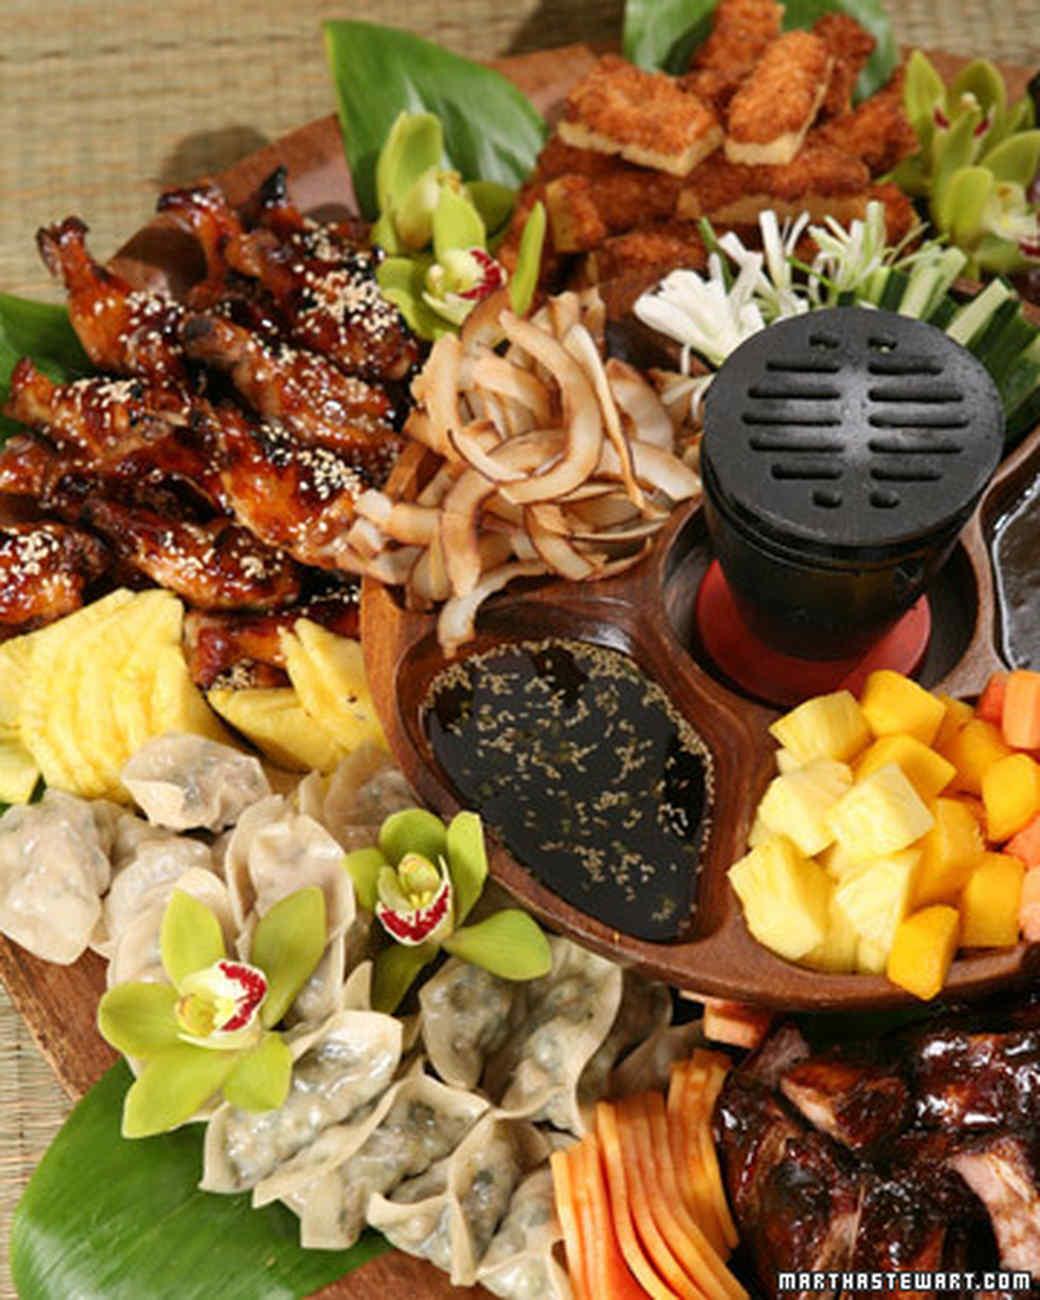 Forum on this topic: Polynesian Glazed Chicken Wings, polynesian-glazed-chicken-wings/